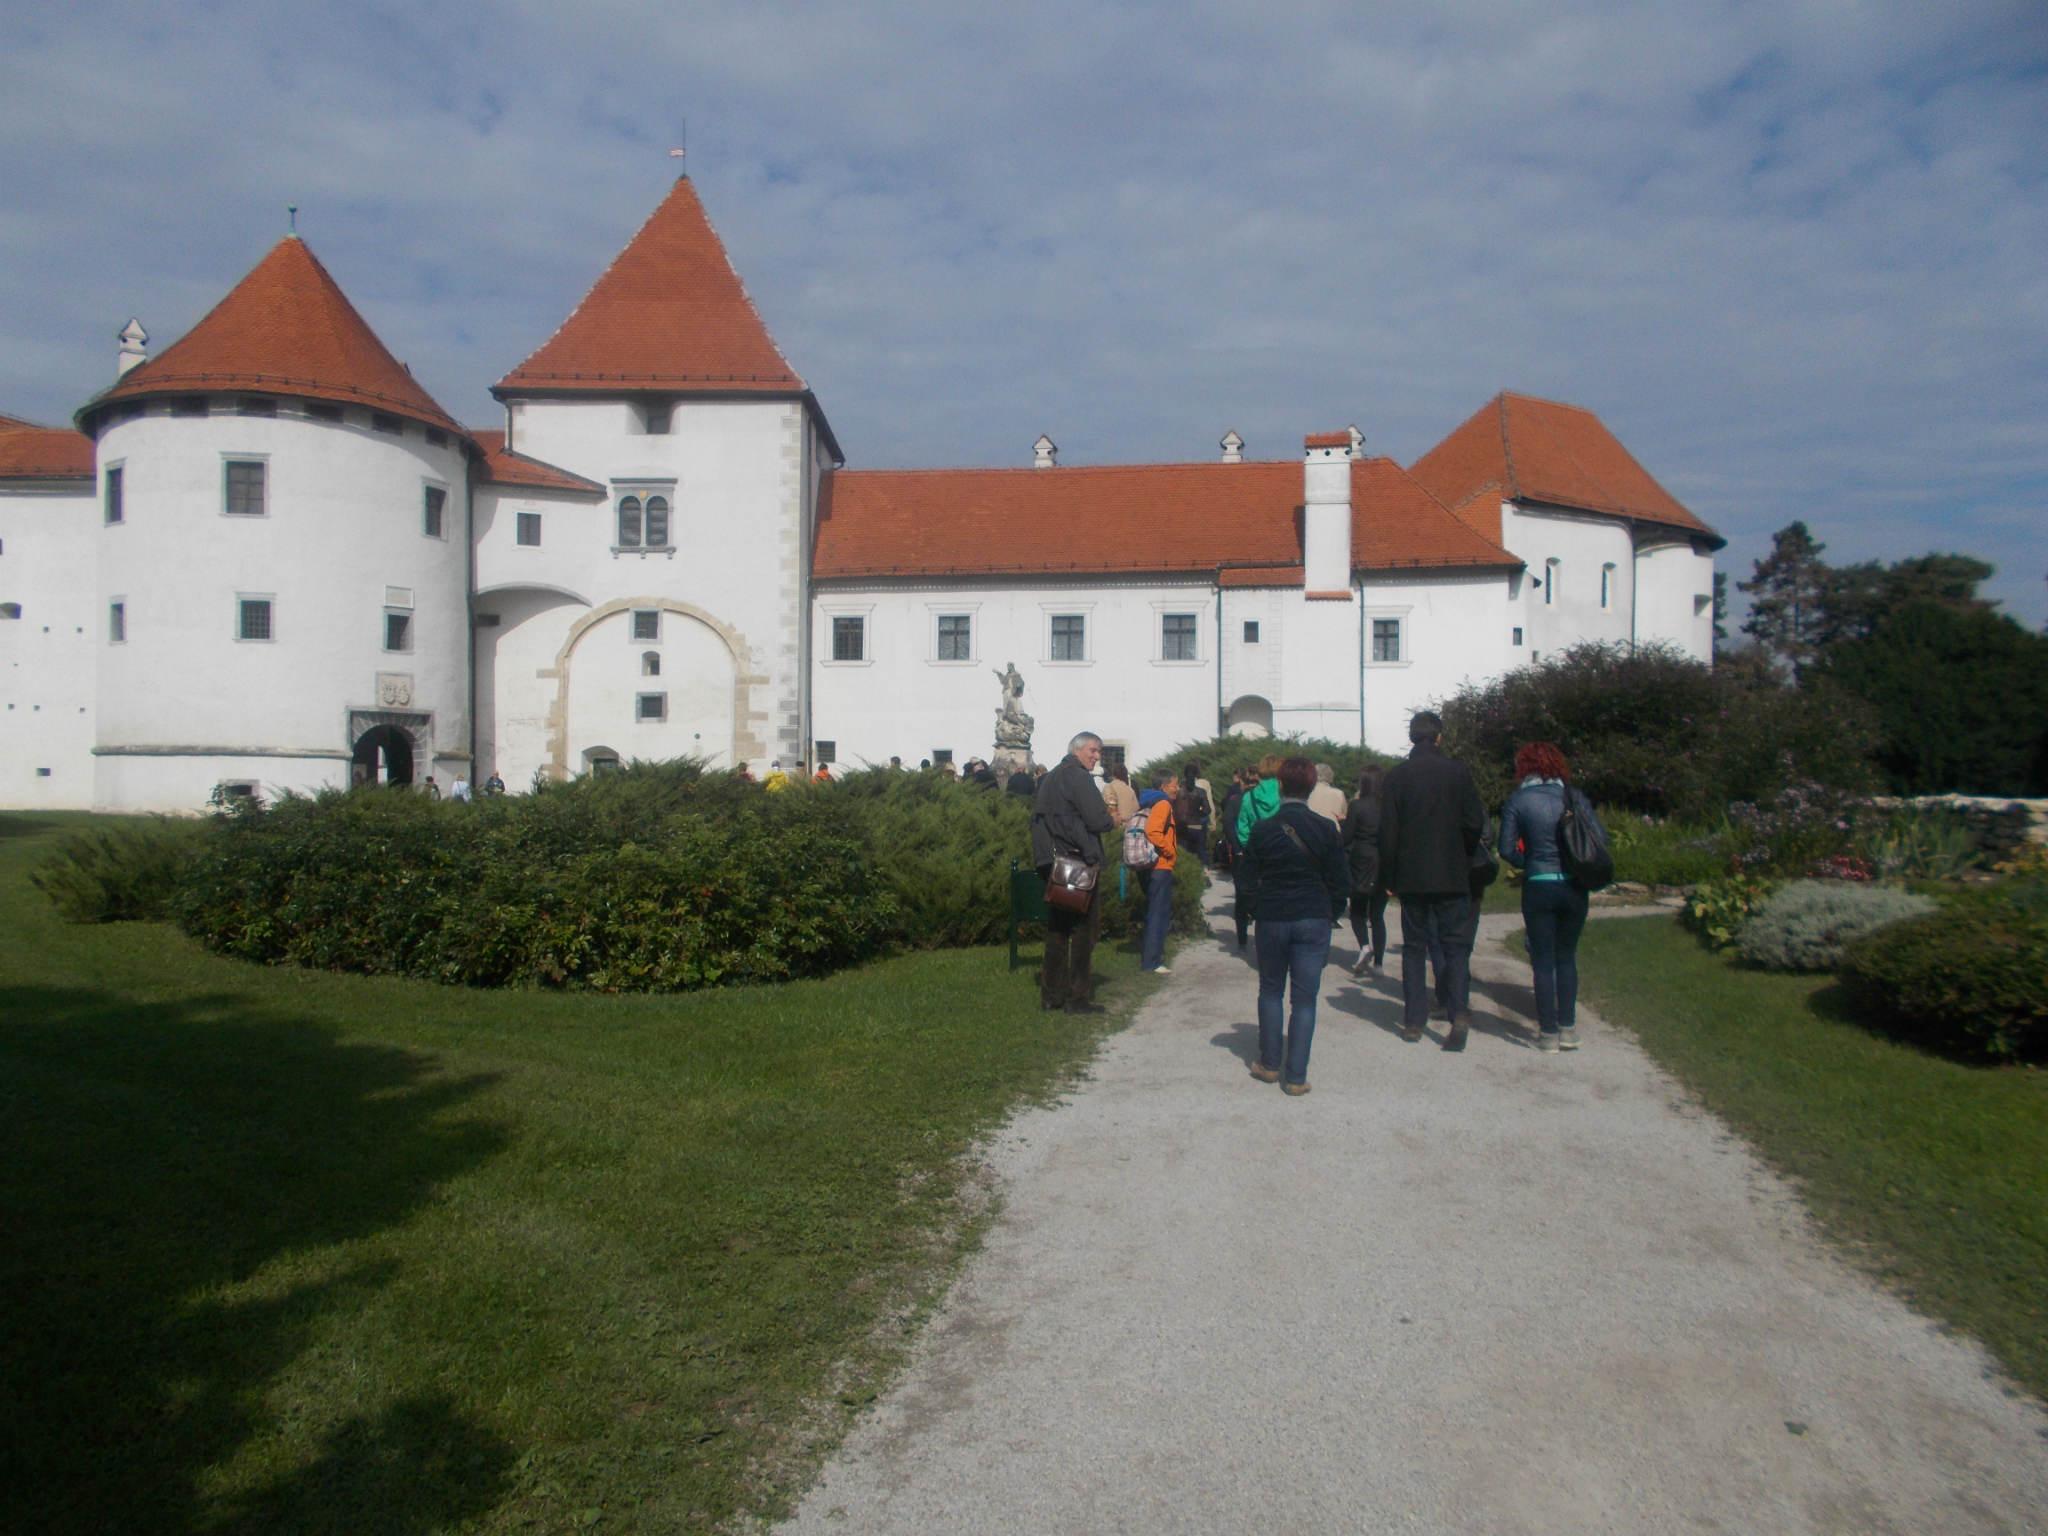 Ljudska univerza Ormož uspešno izvedla projekt EVROPA ZA DRŽAVLJANE: S potepa po Varaždinu…